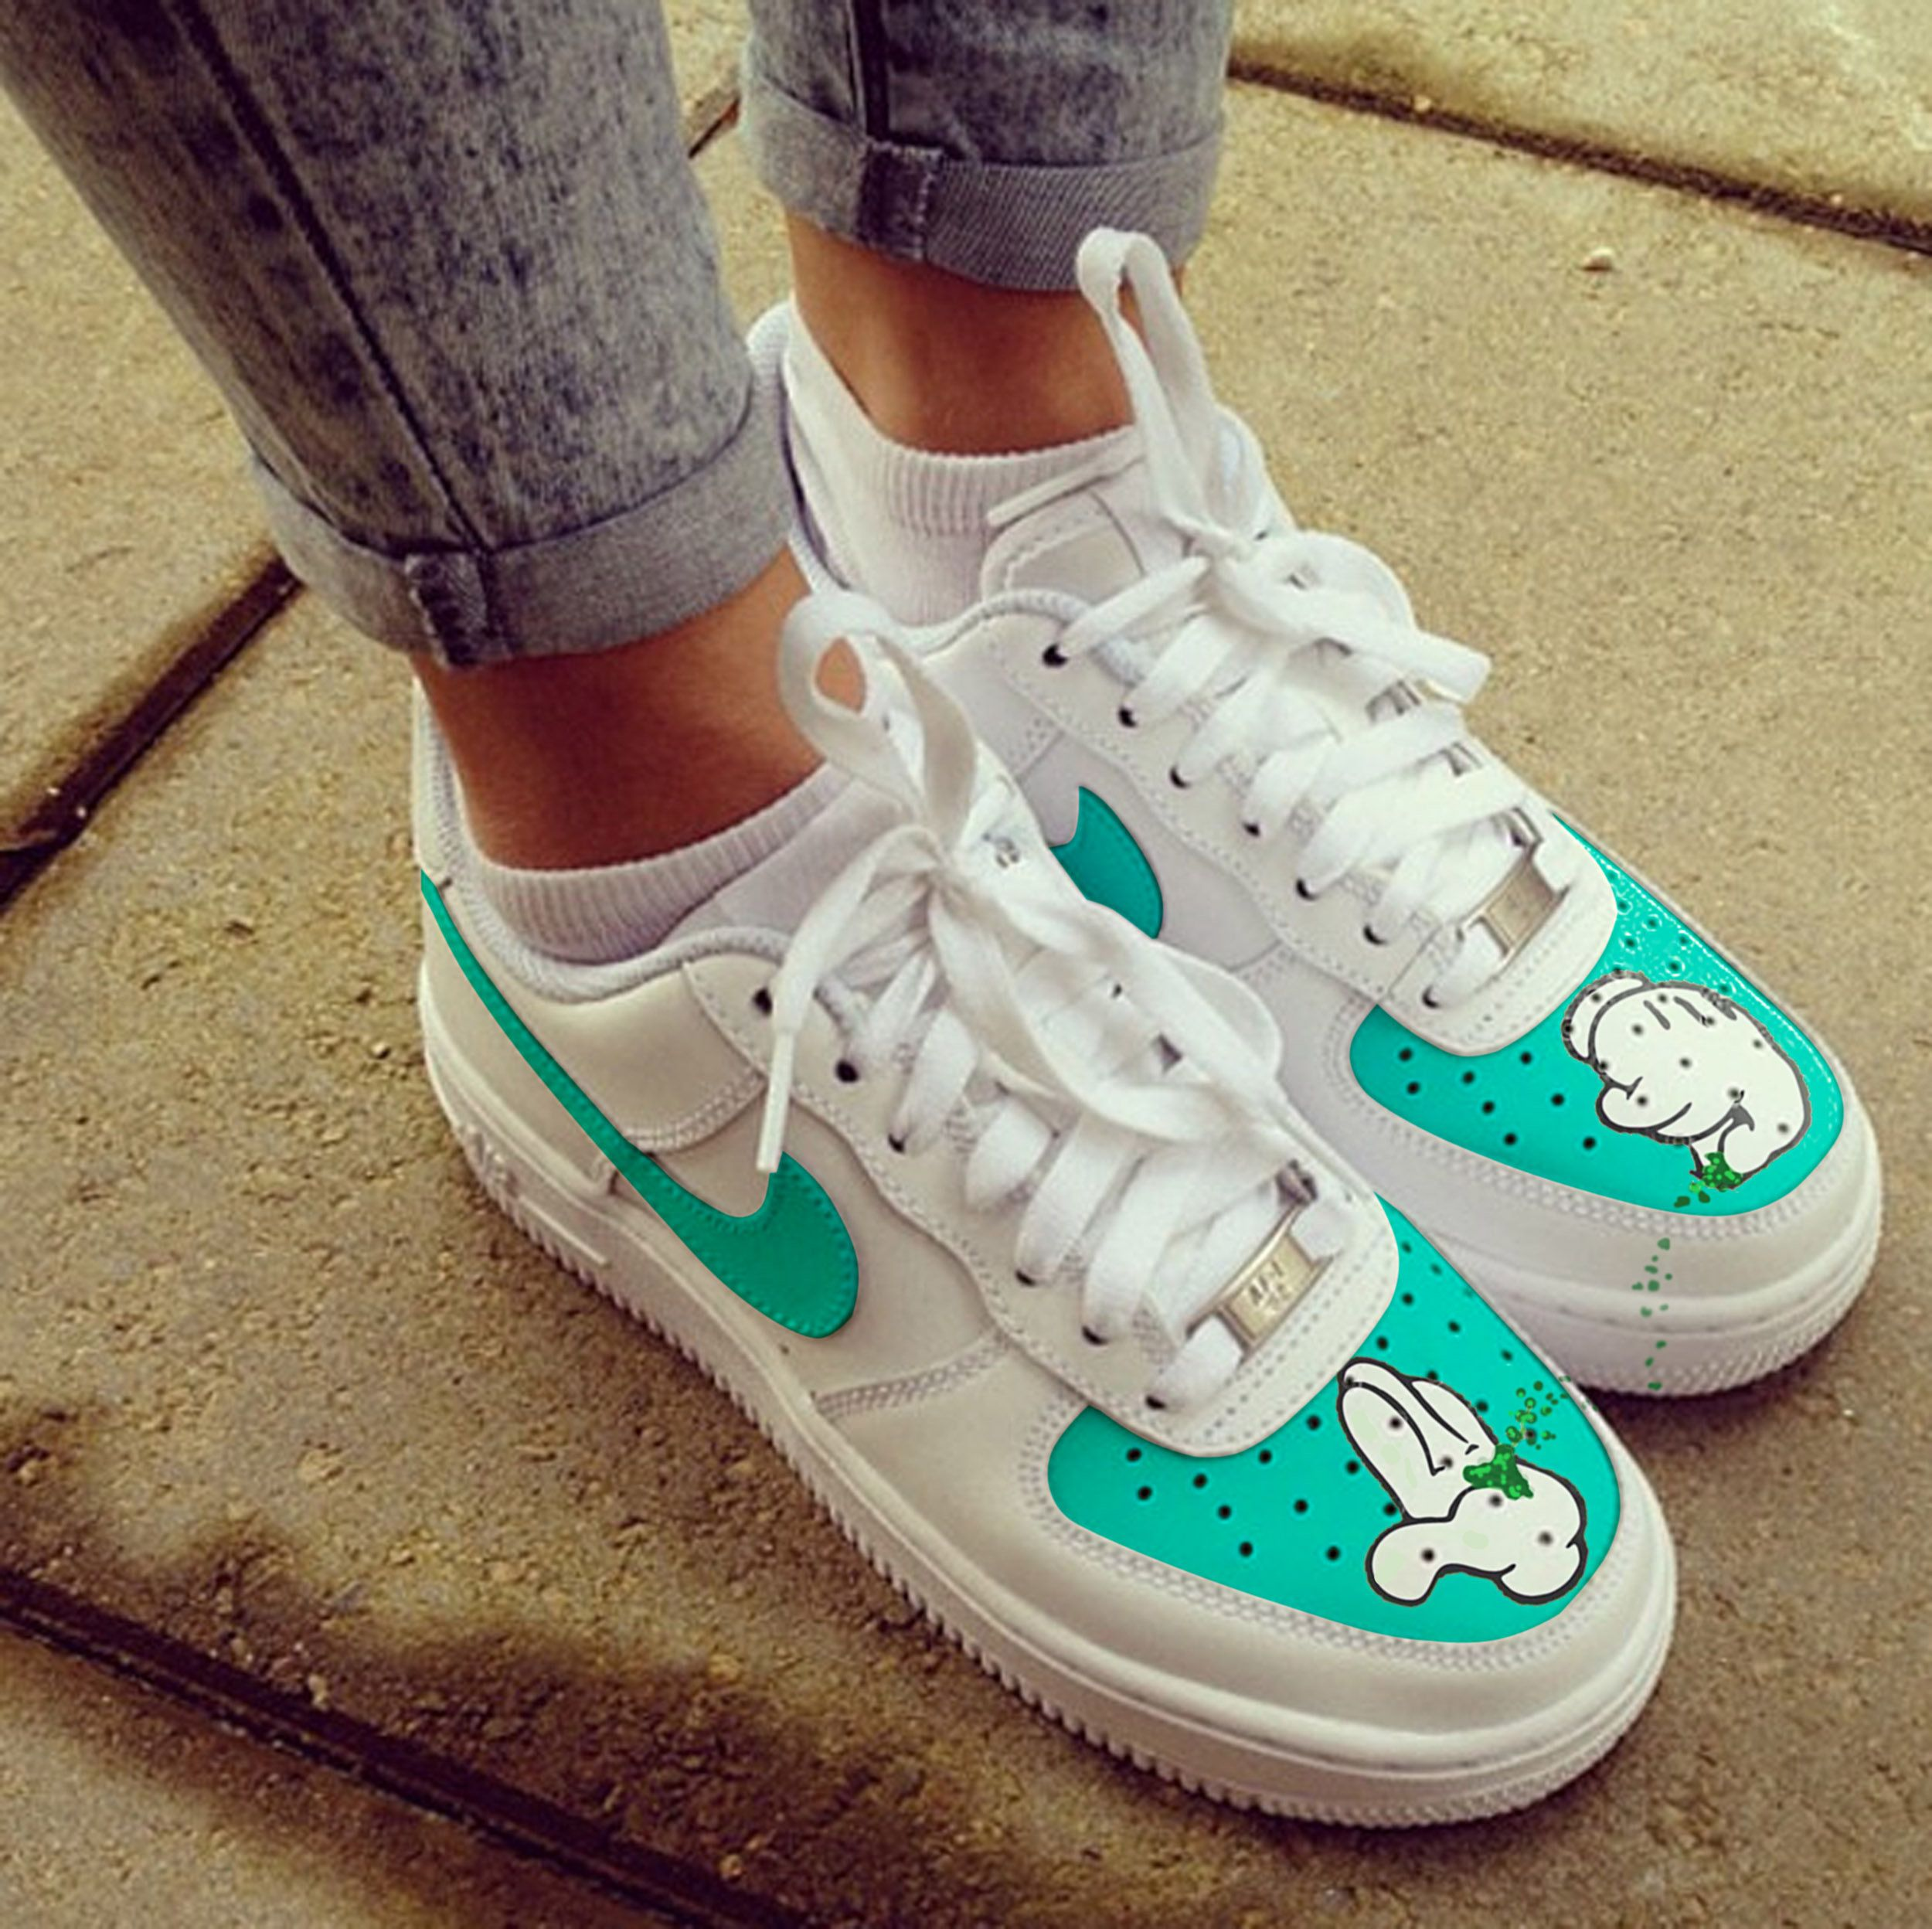 Custom Nike Air Force one, micky mouse,weed,grinder,custom sneakers